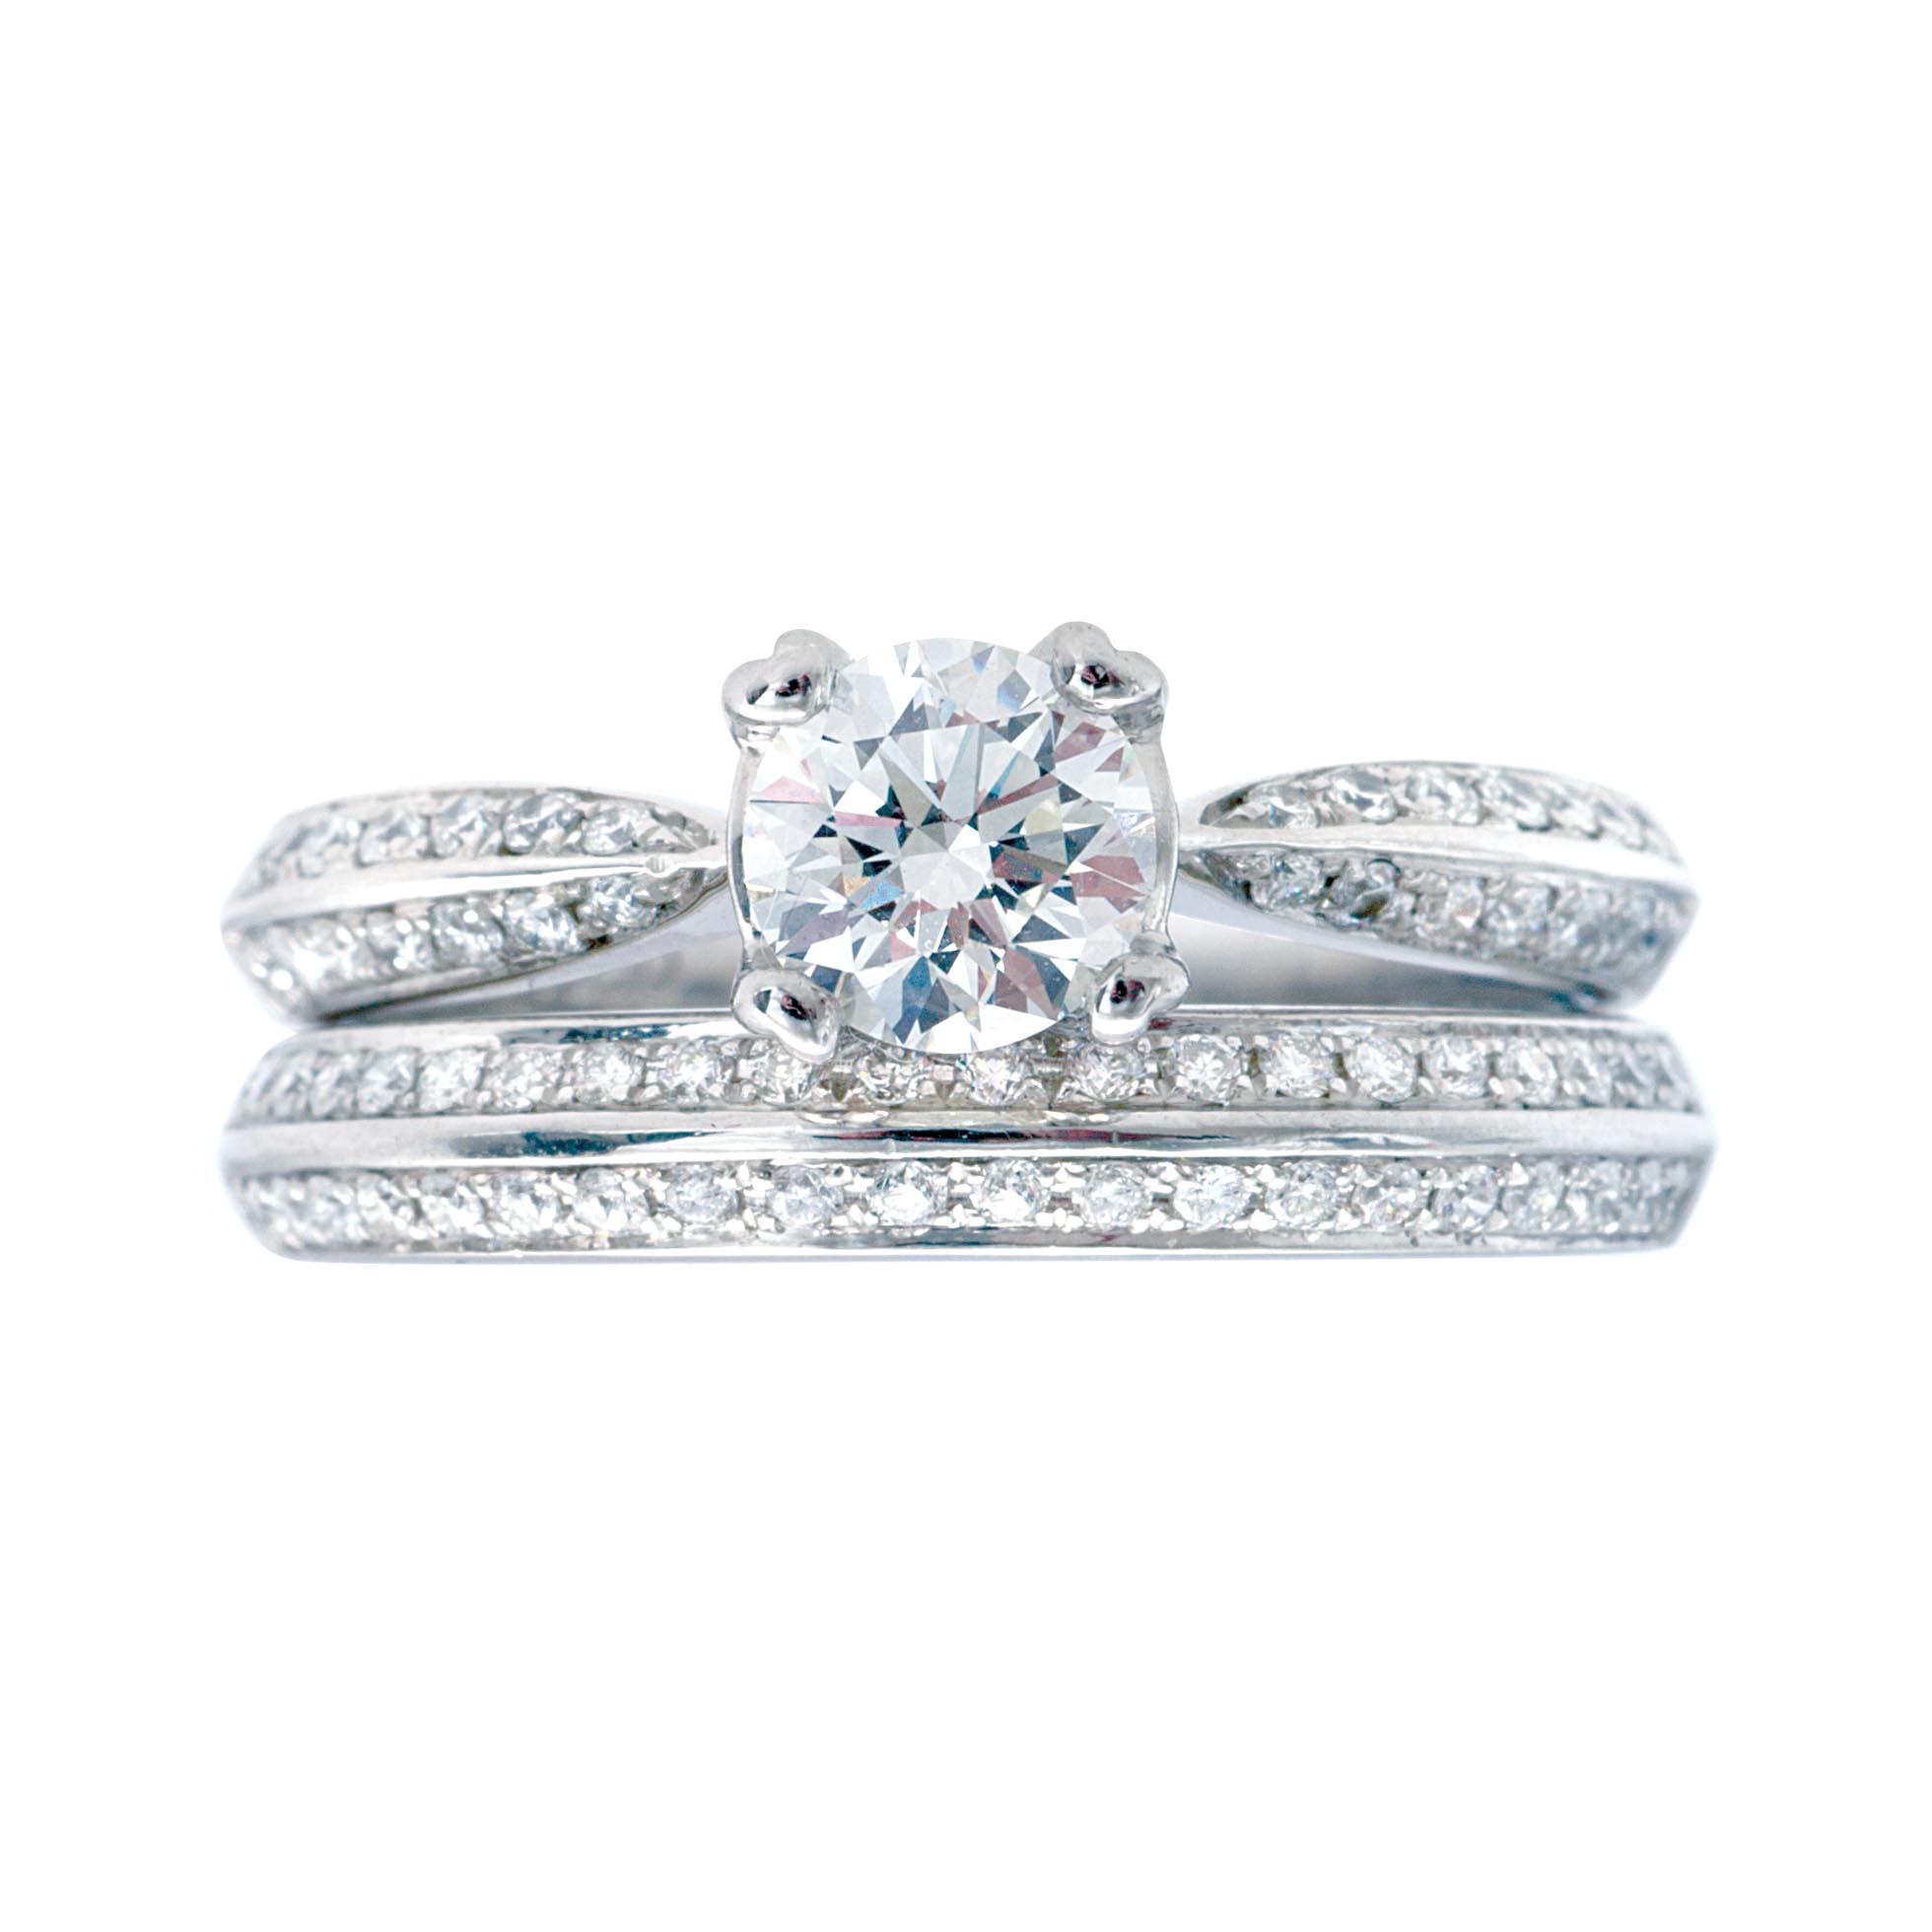 Vintage 1.16 CTW Diamond Engagement Ring & Wedding Band Set